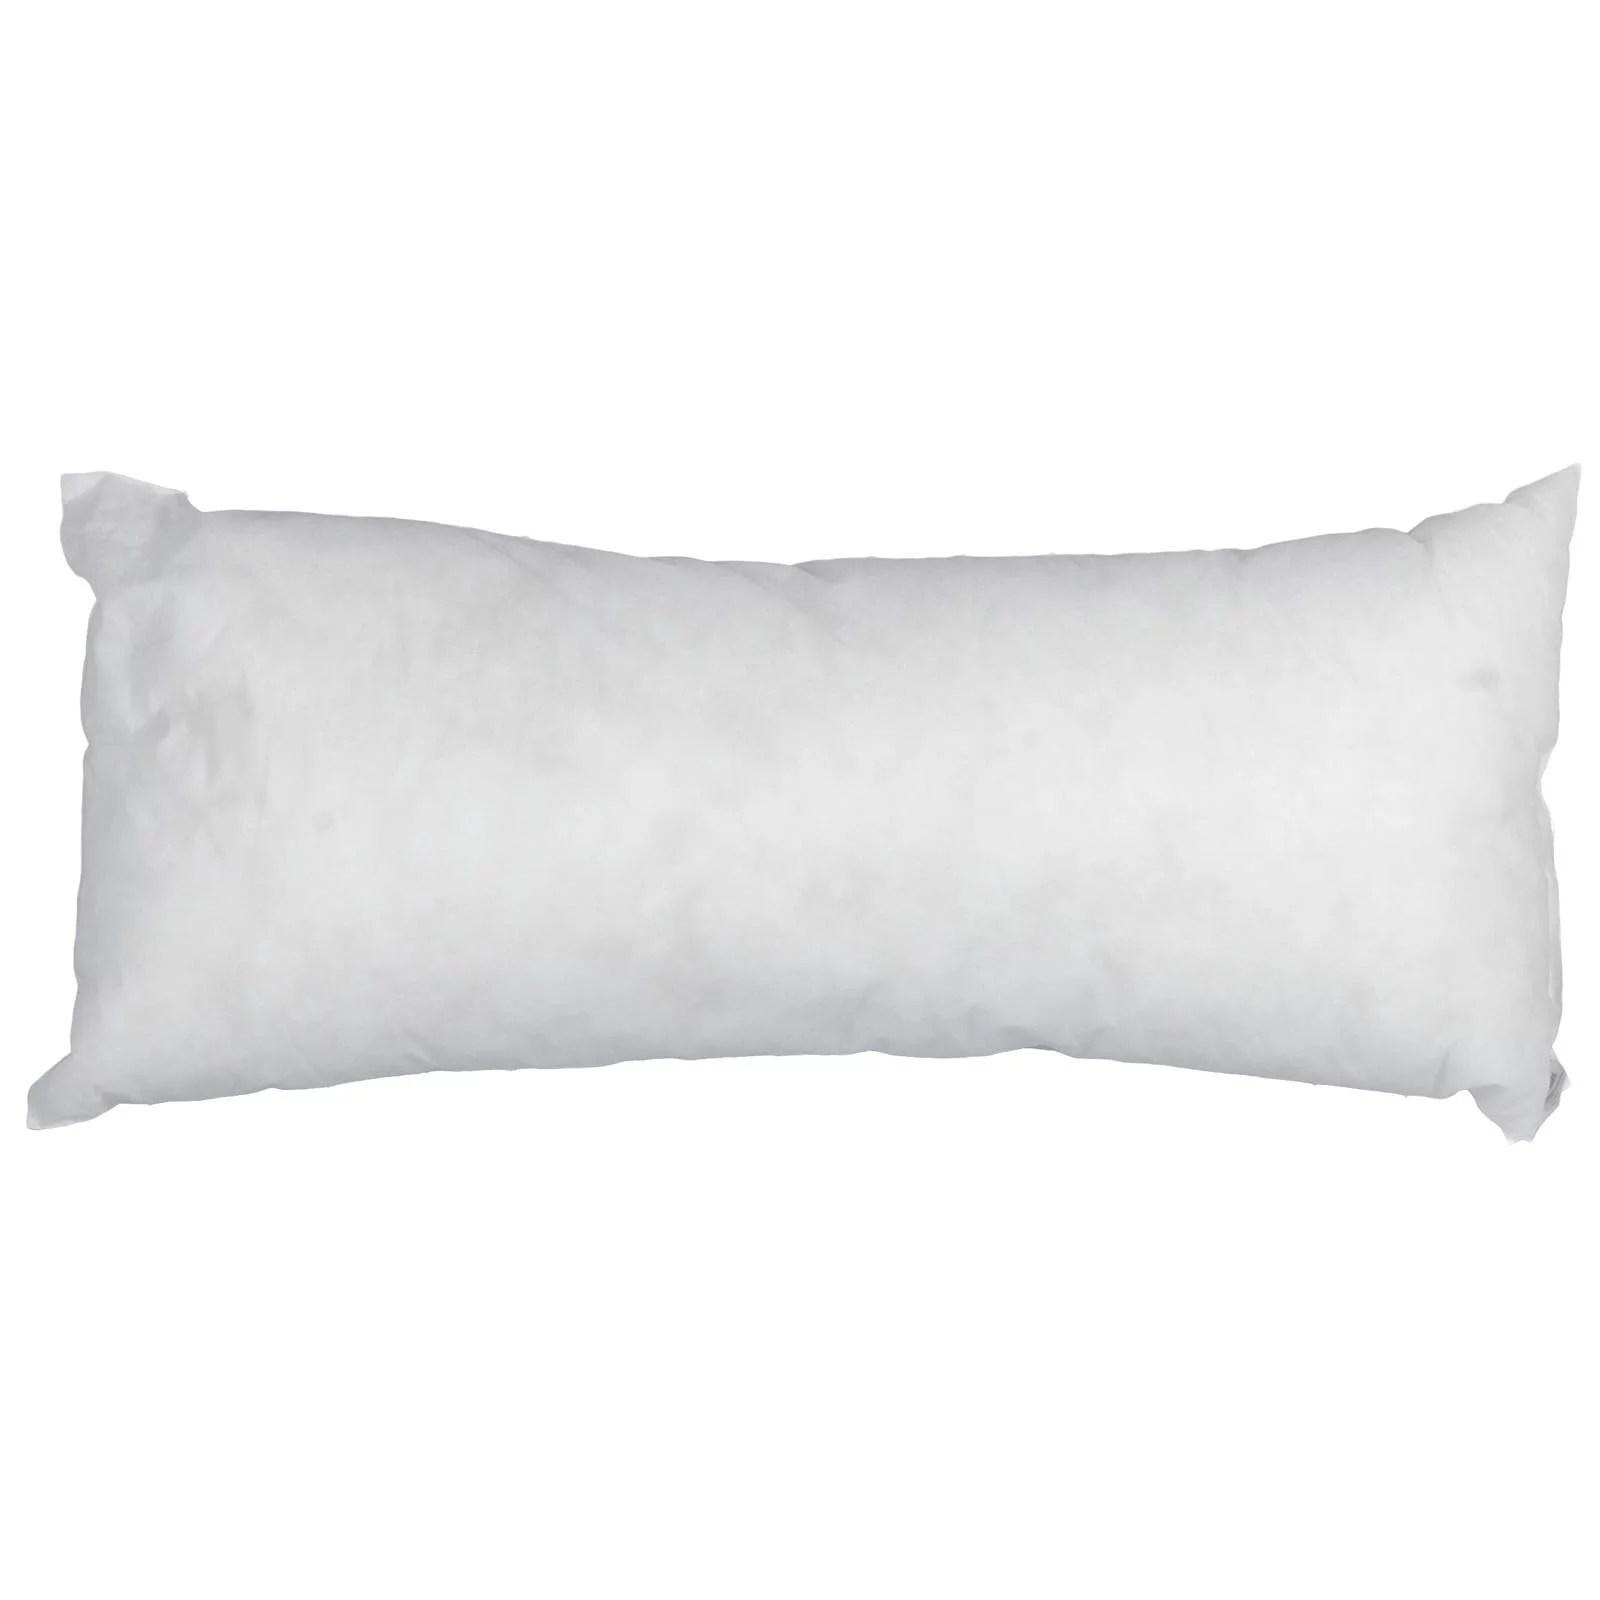 bolster pillow insert